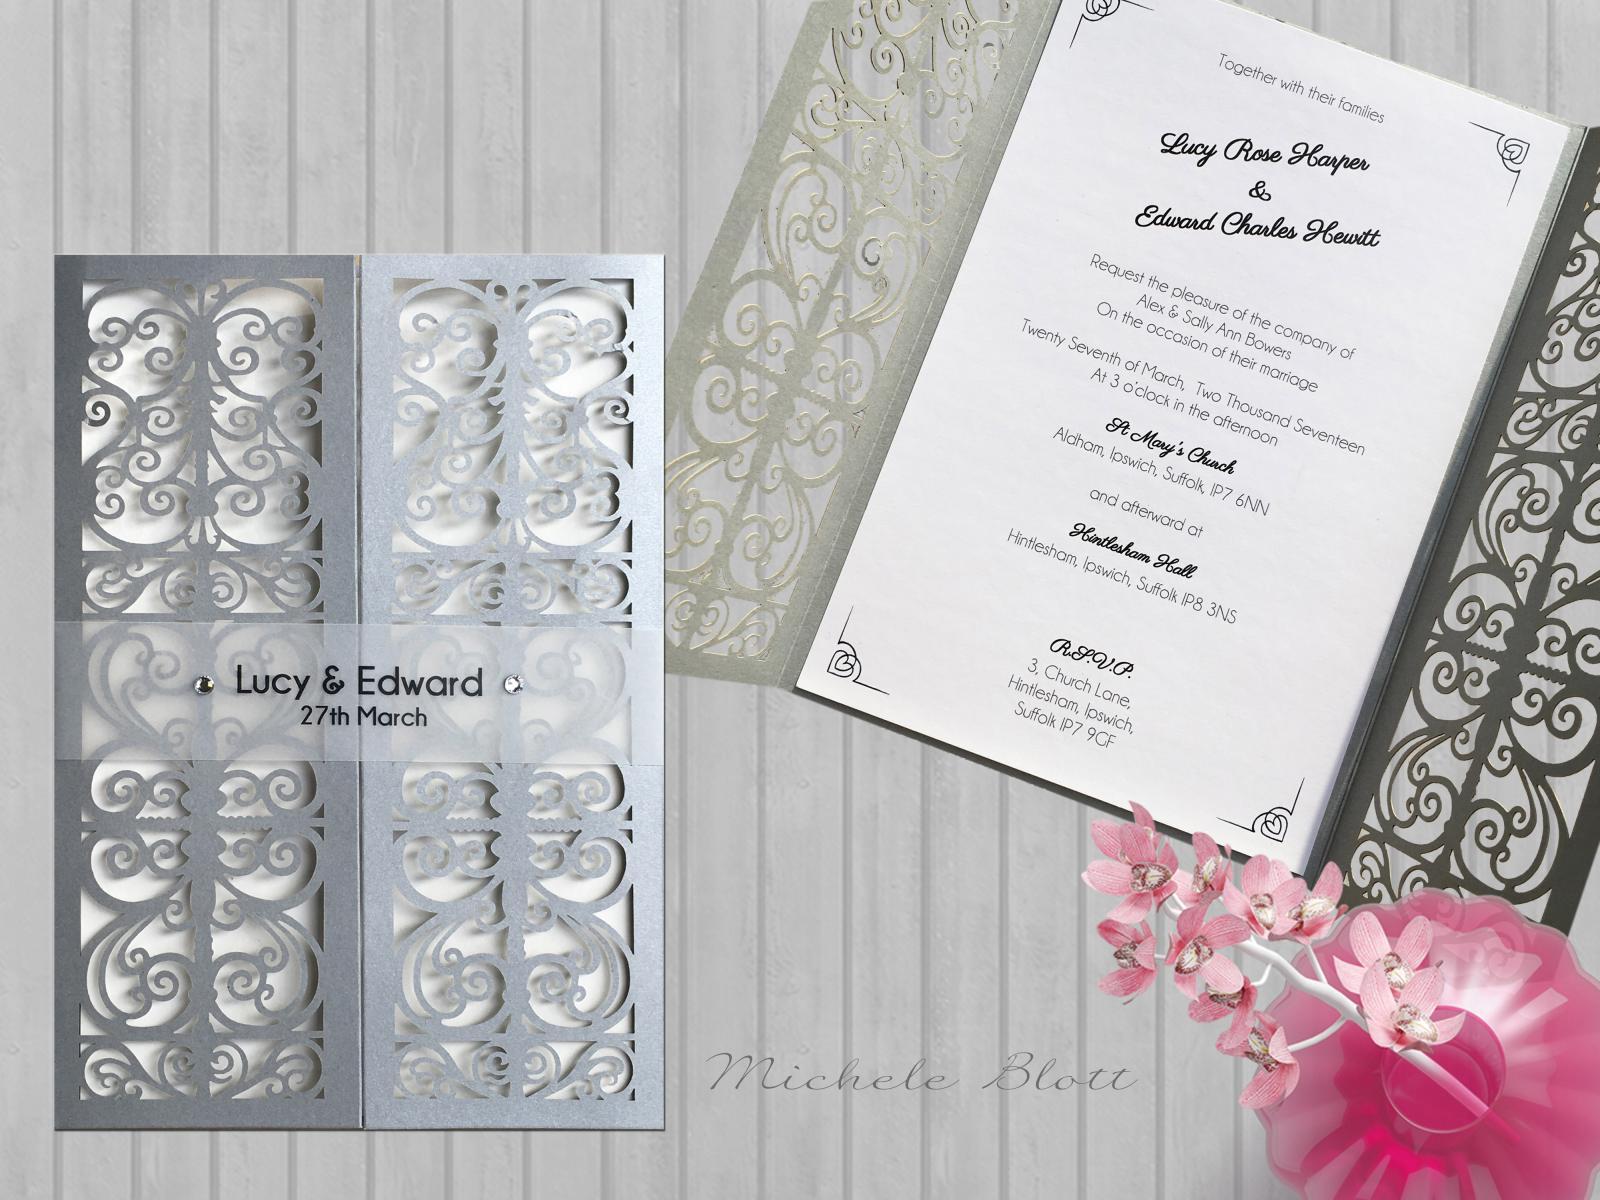 silver_monogram_laser_cut_gatefold_wedding_invitation.jpg